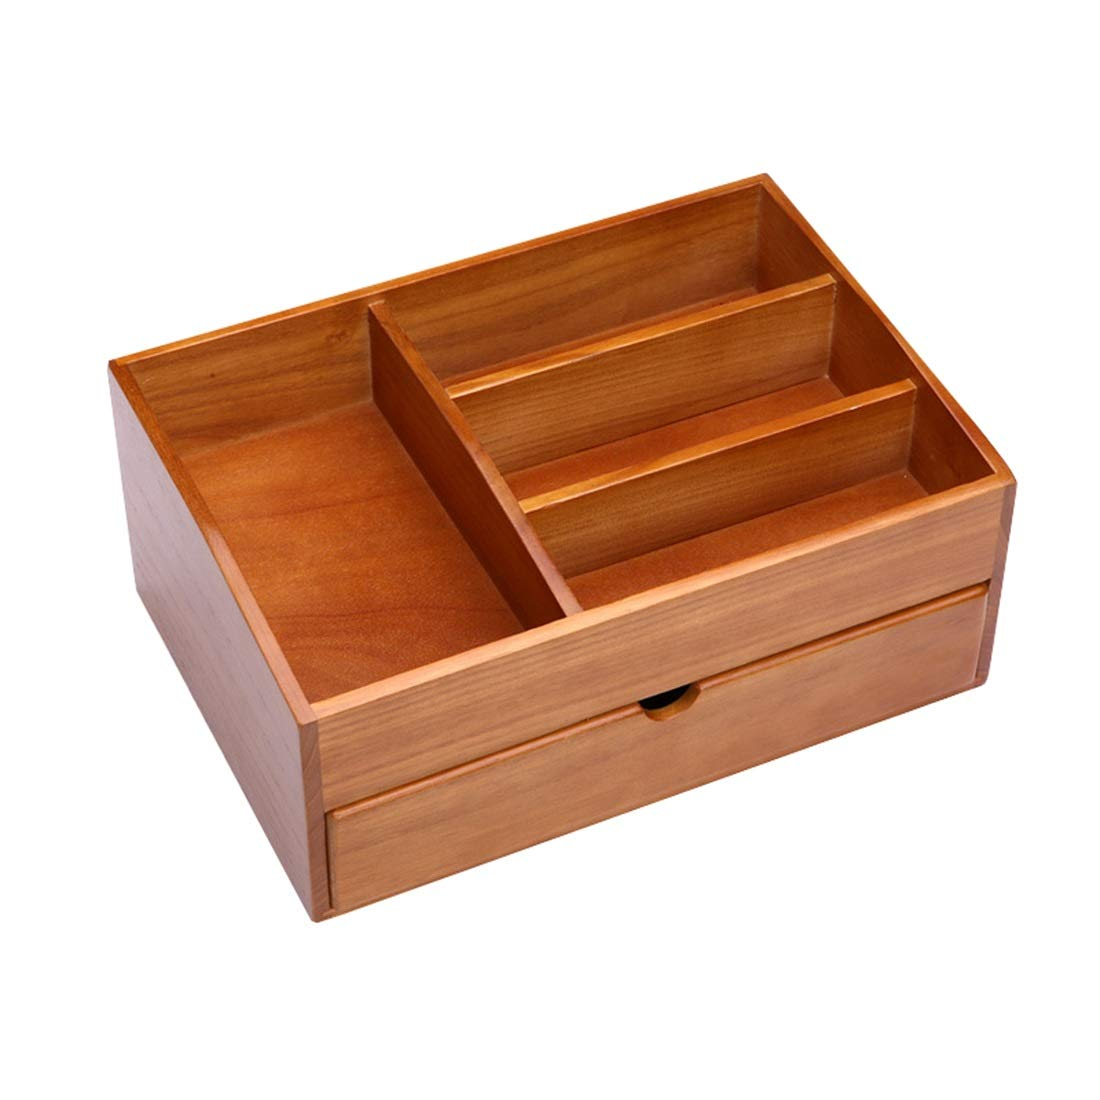 KERVINJESSIE Handmade Wooden Desktop Solid Wood Cosmetics Storage Box/Drawer/Miscellaneous Jewelry Retro Office Storage (Color : Brown)